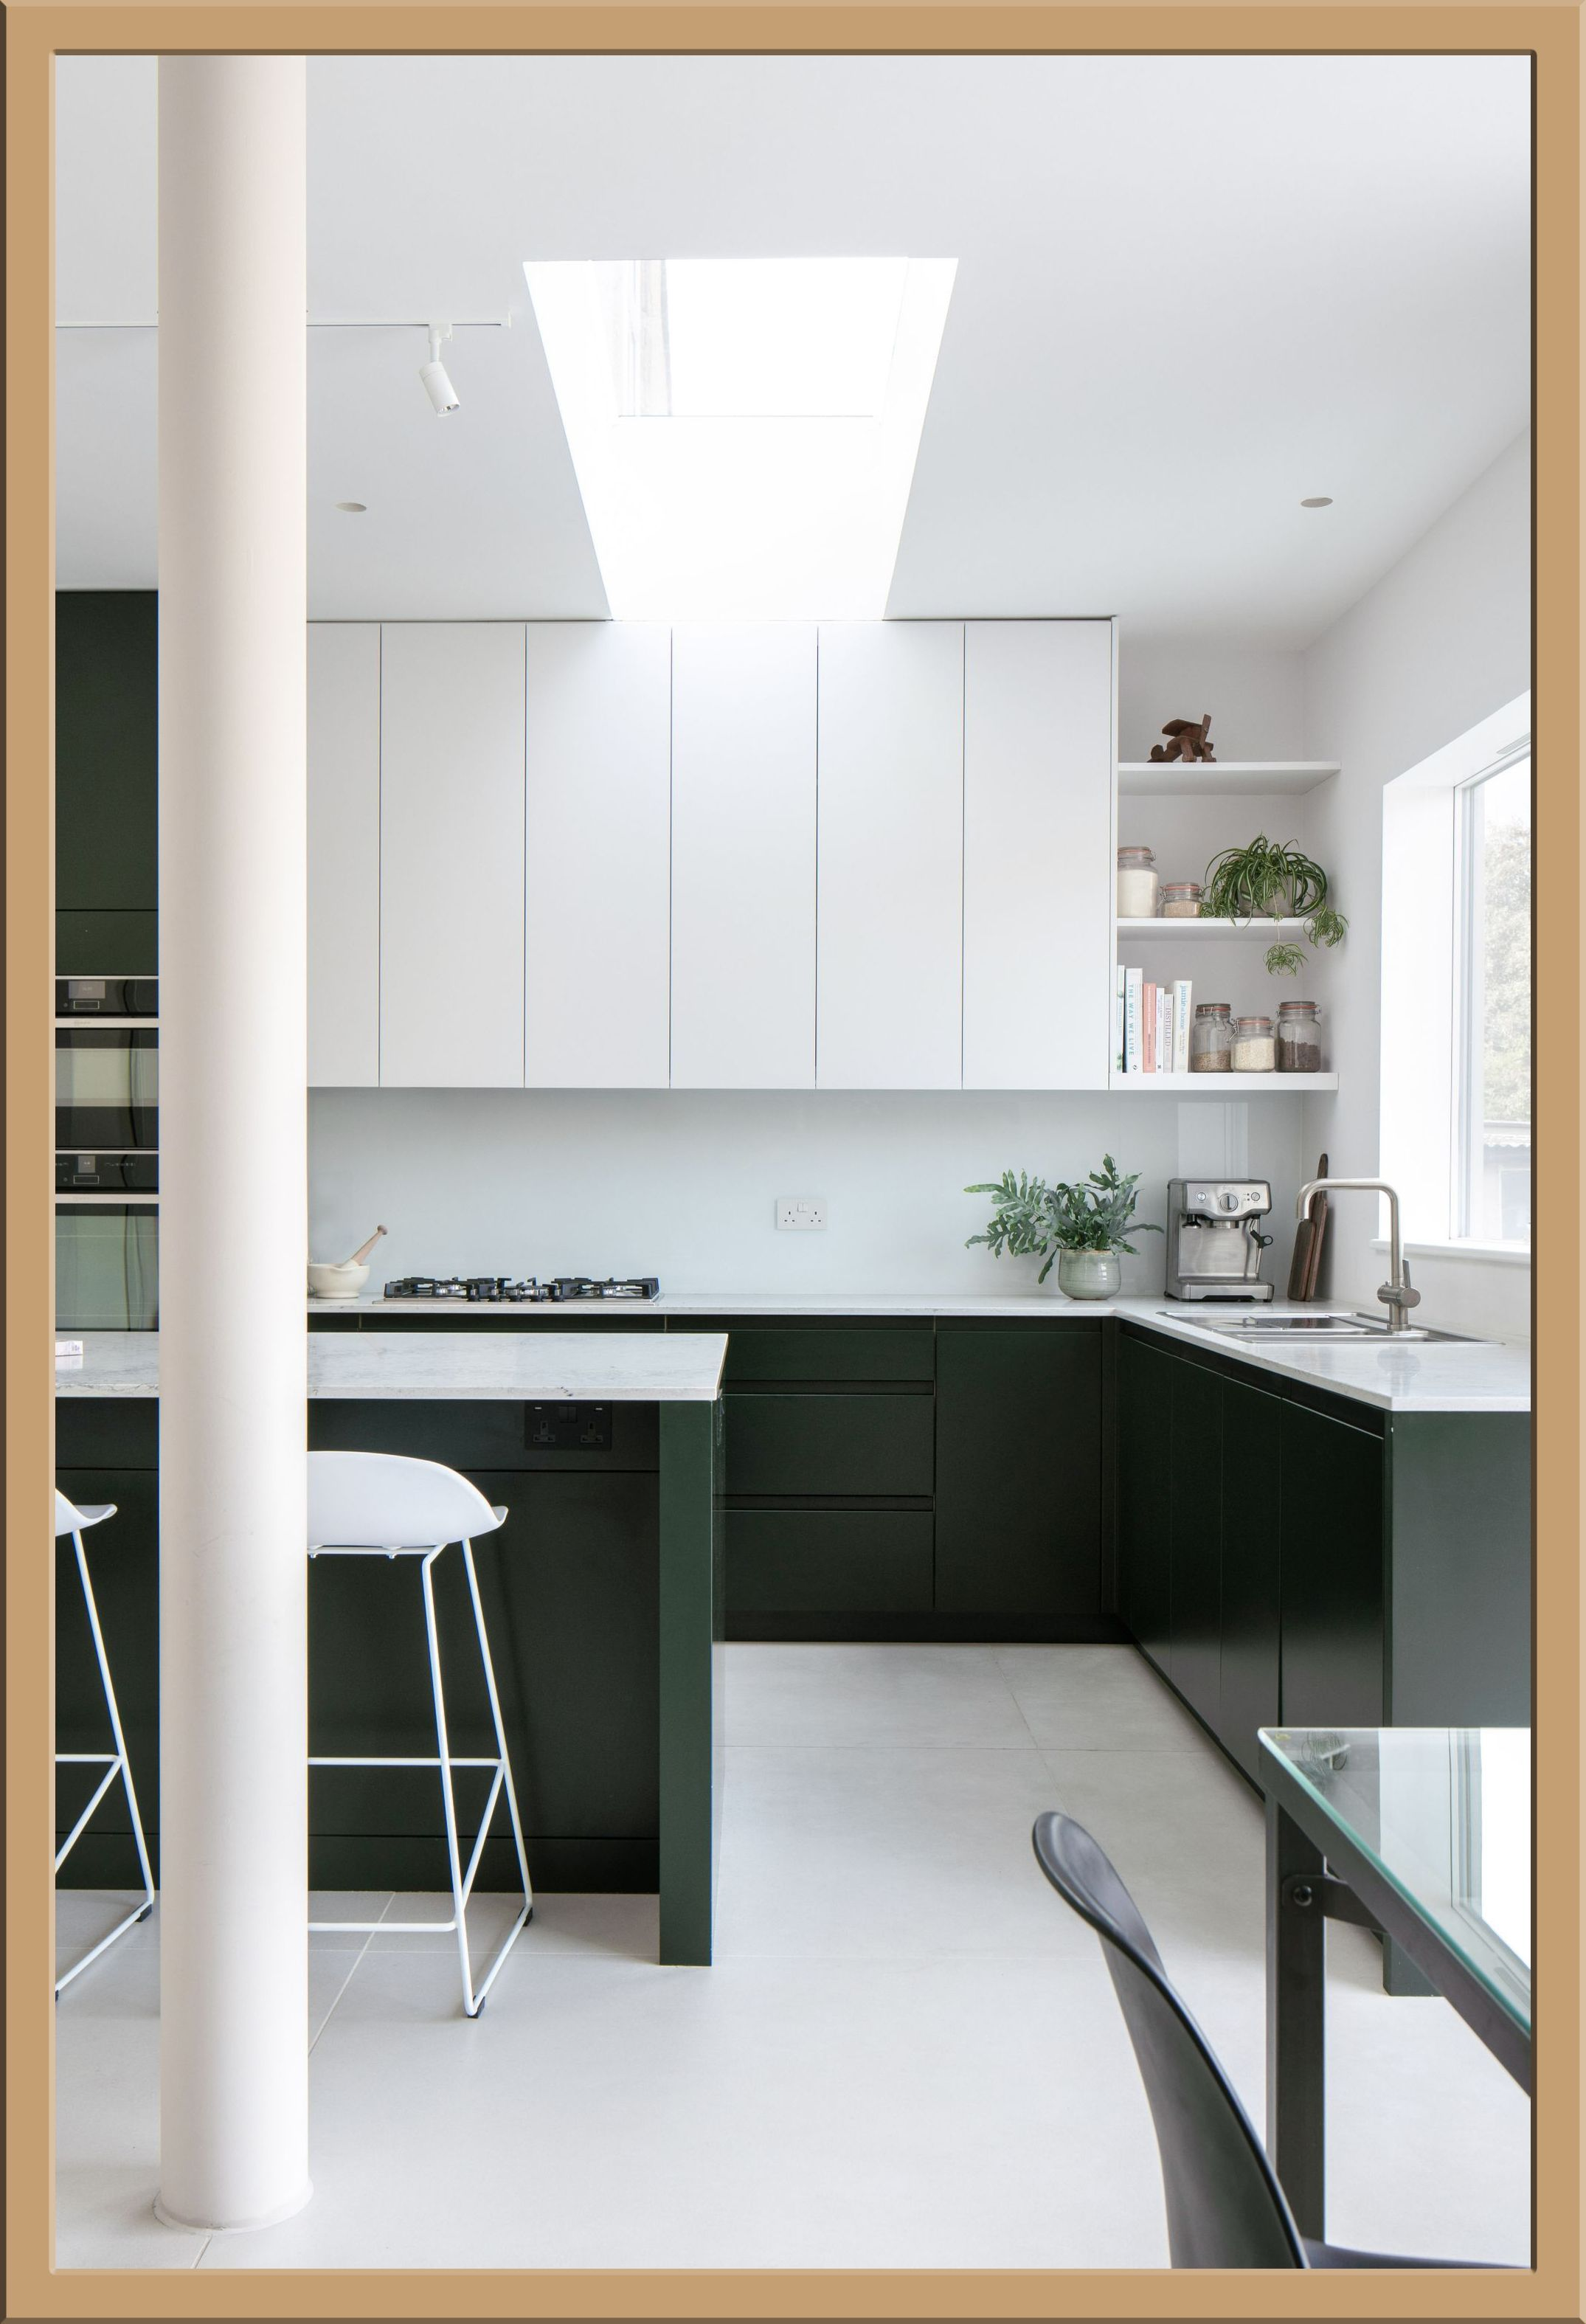 How To Sell Kitchen Decor In 2020 Kitchen Decor Skylight Kitchen Kitchen Design